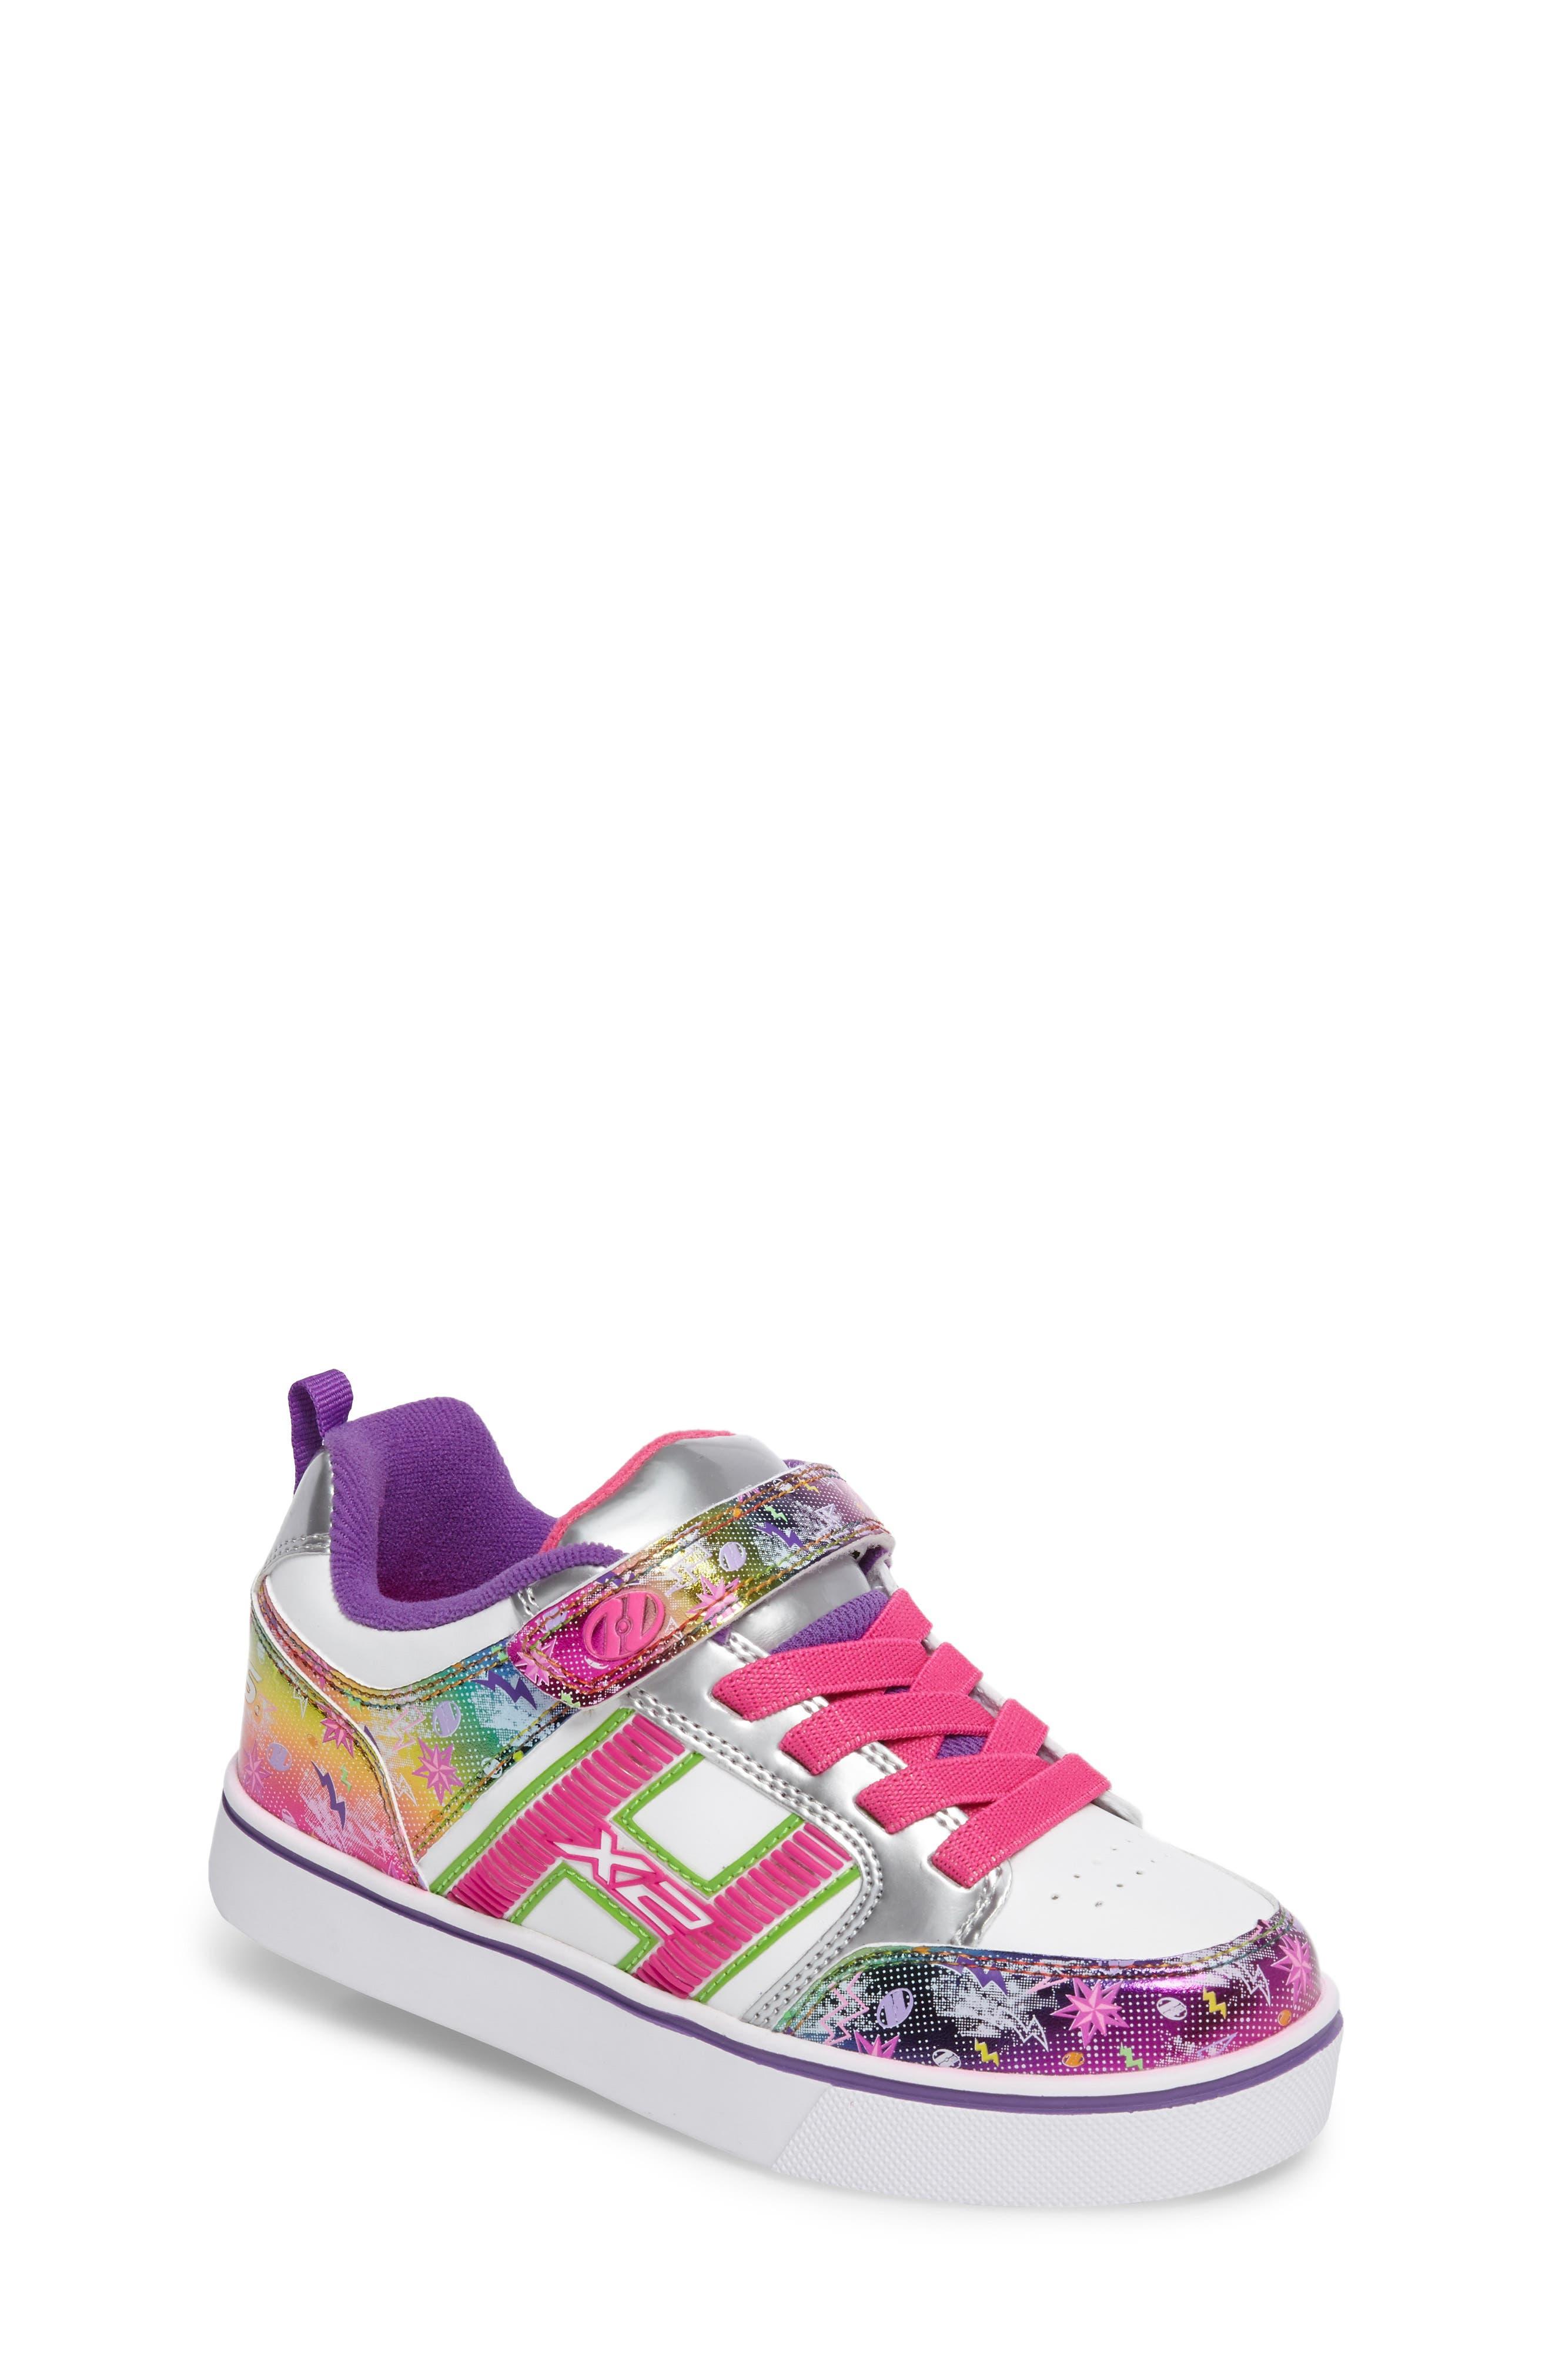 Bolt Plus X2 Light-Up Skate Sneaker,                             Main thumbnail 1, color,                             162